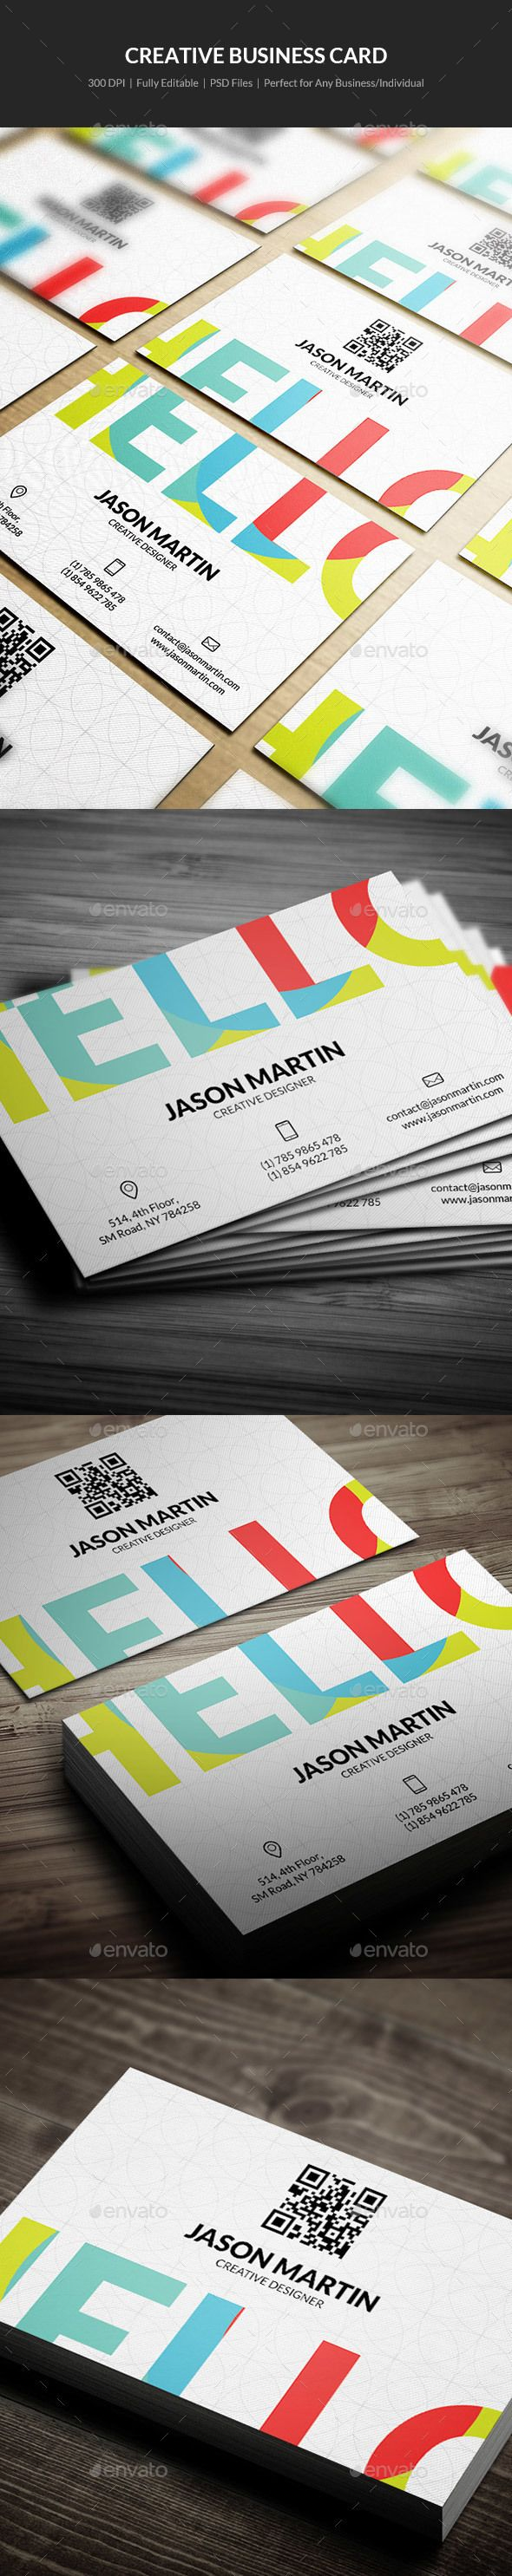 Creative Business Card Template PSD #design Download: http://graphicriver.net/item/creative-business-card-02/13897806?ref=ksioks